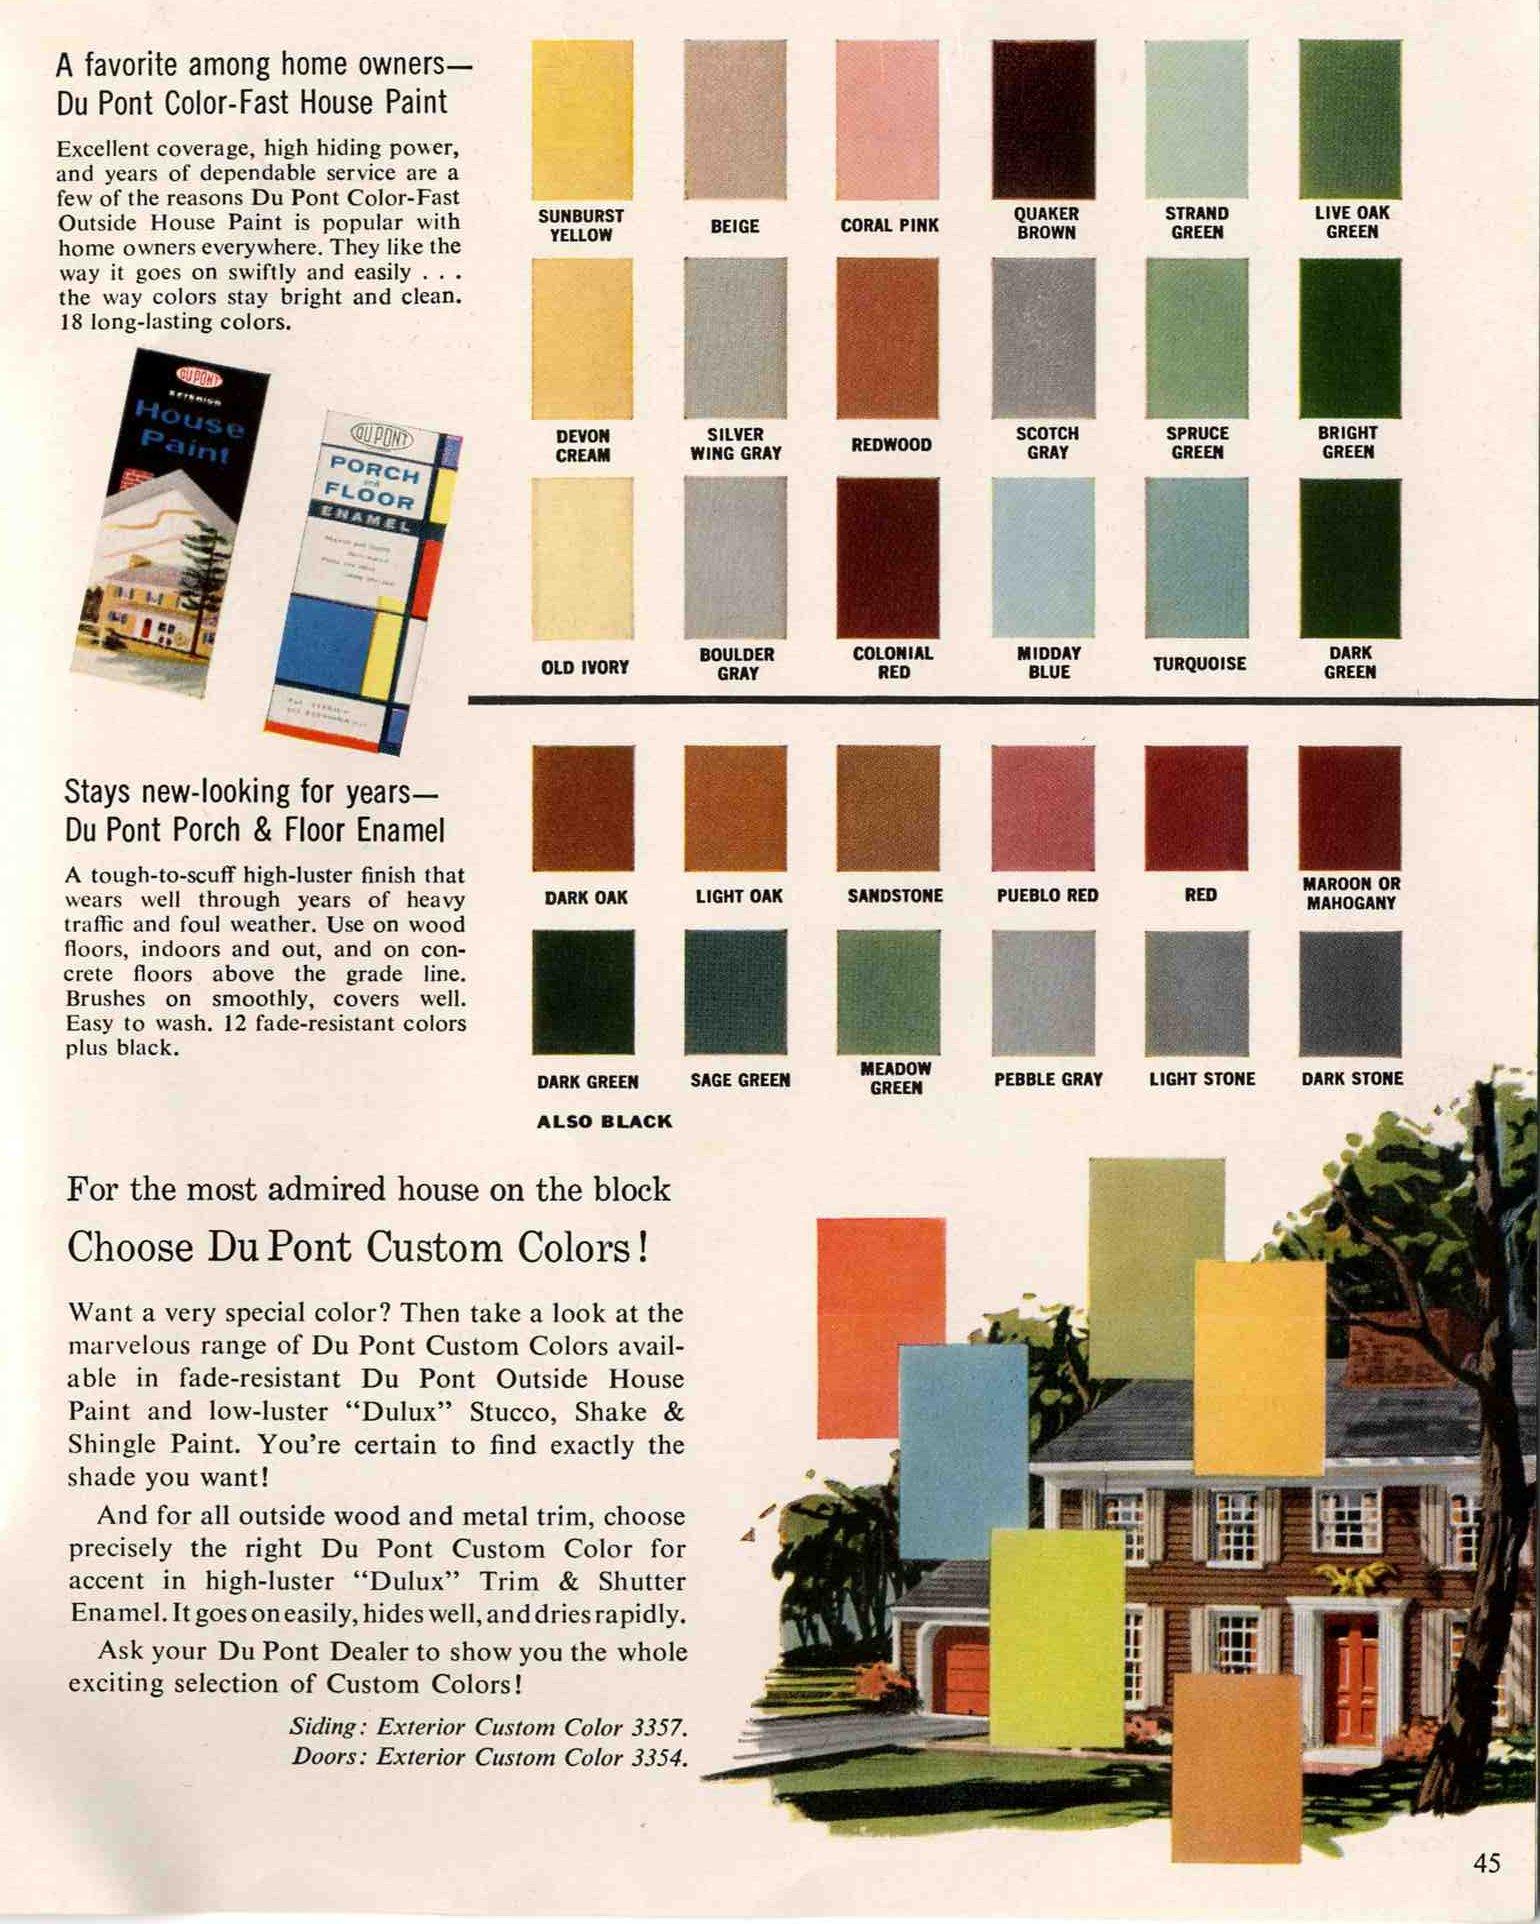 Miraculous Exterior Colors For 1960 Houses Retro Renovation Largest Home Design Picture Inspirations Pitcheantrous